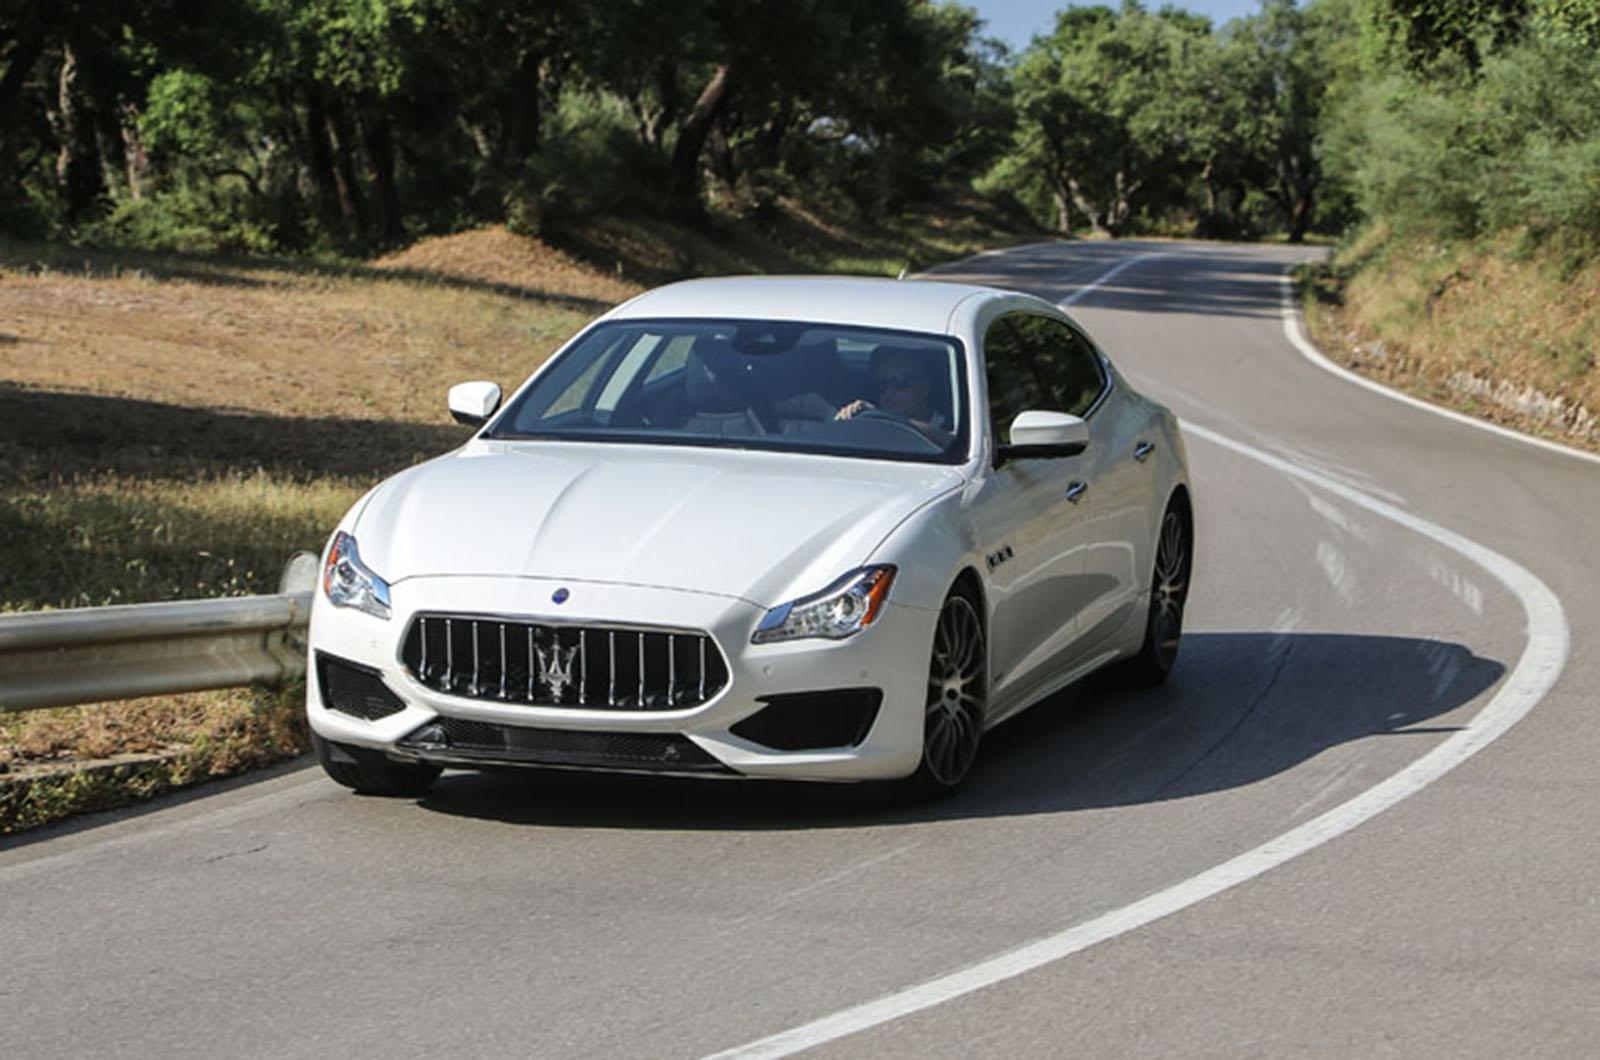 2016 Maserati Quattroporte GTS review review | Autocar